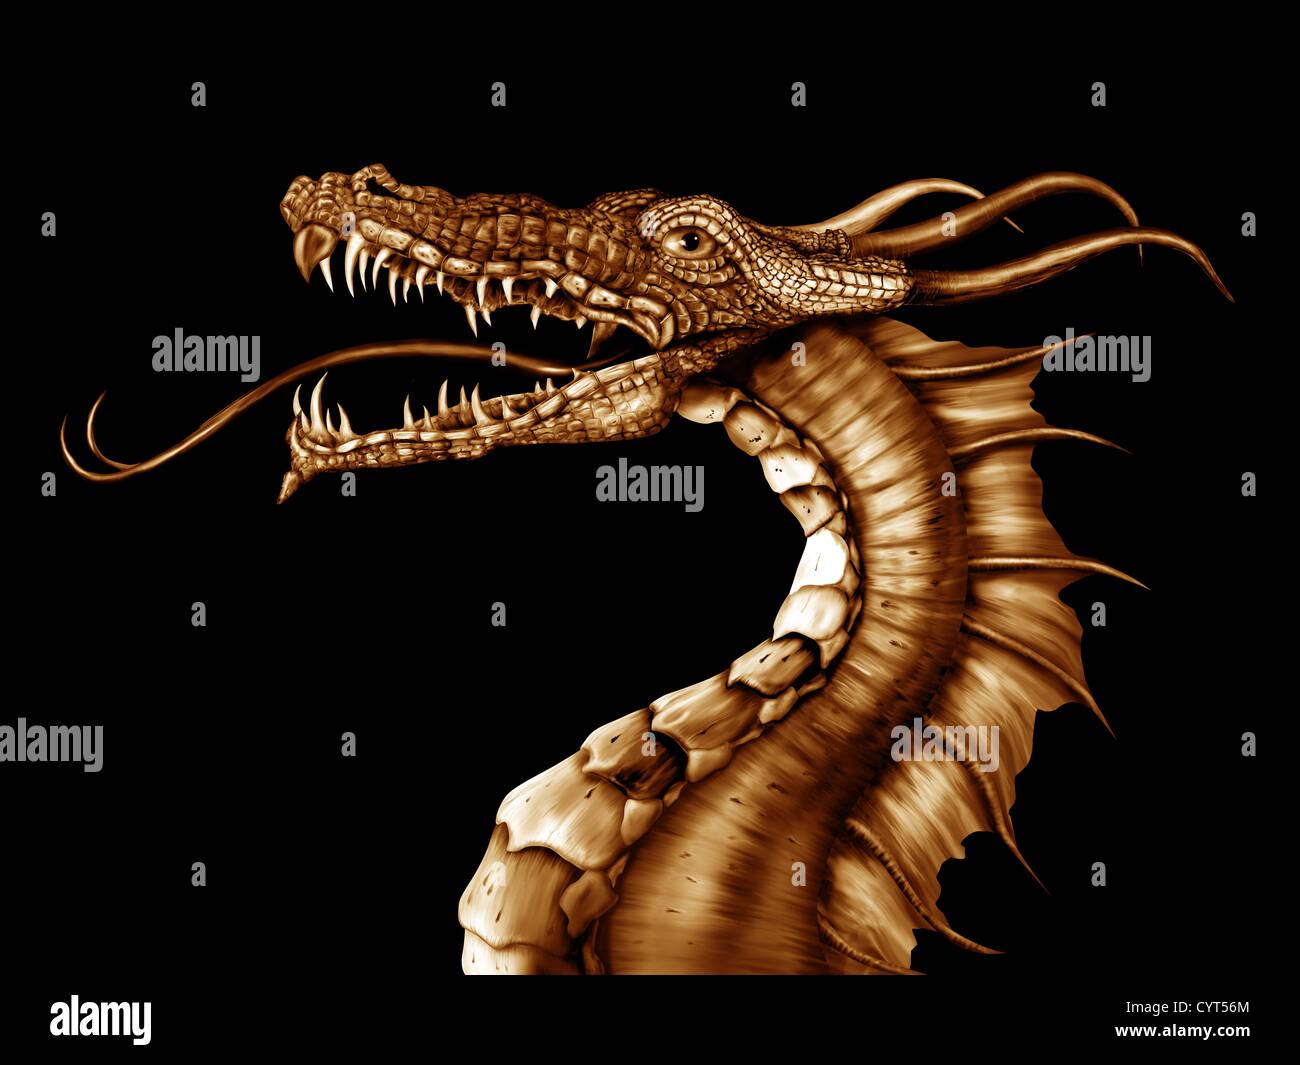 Illustration of a golden dragon on a black background - Stock Image